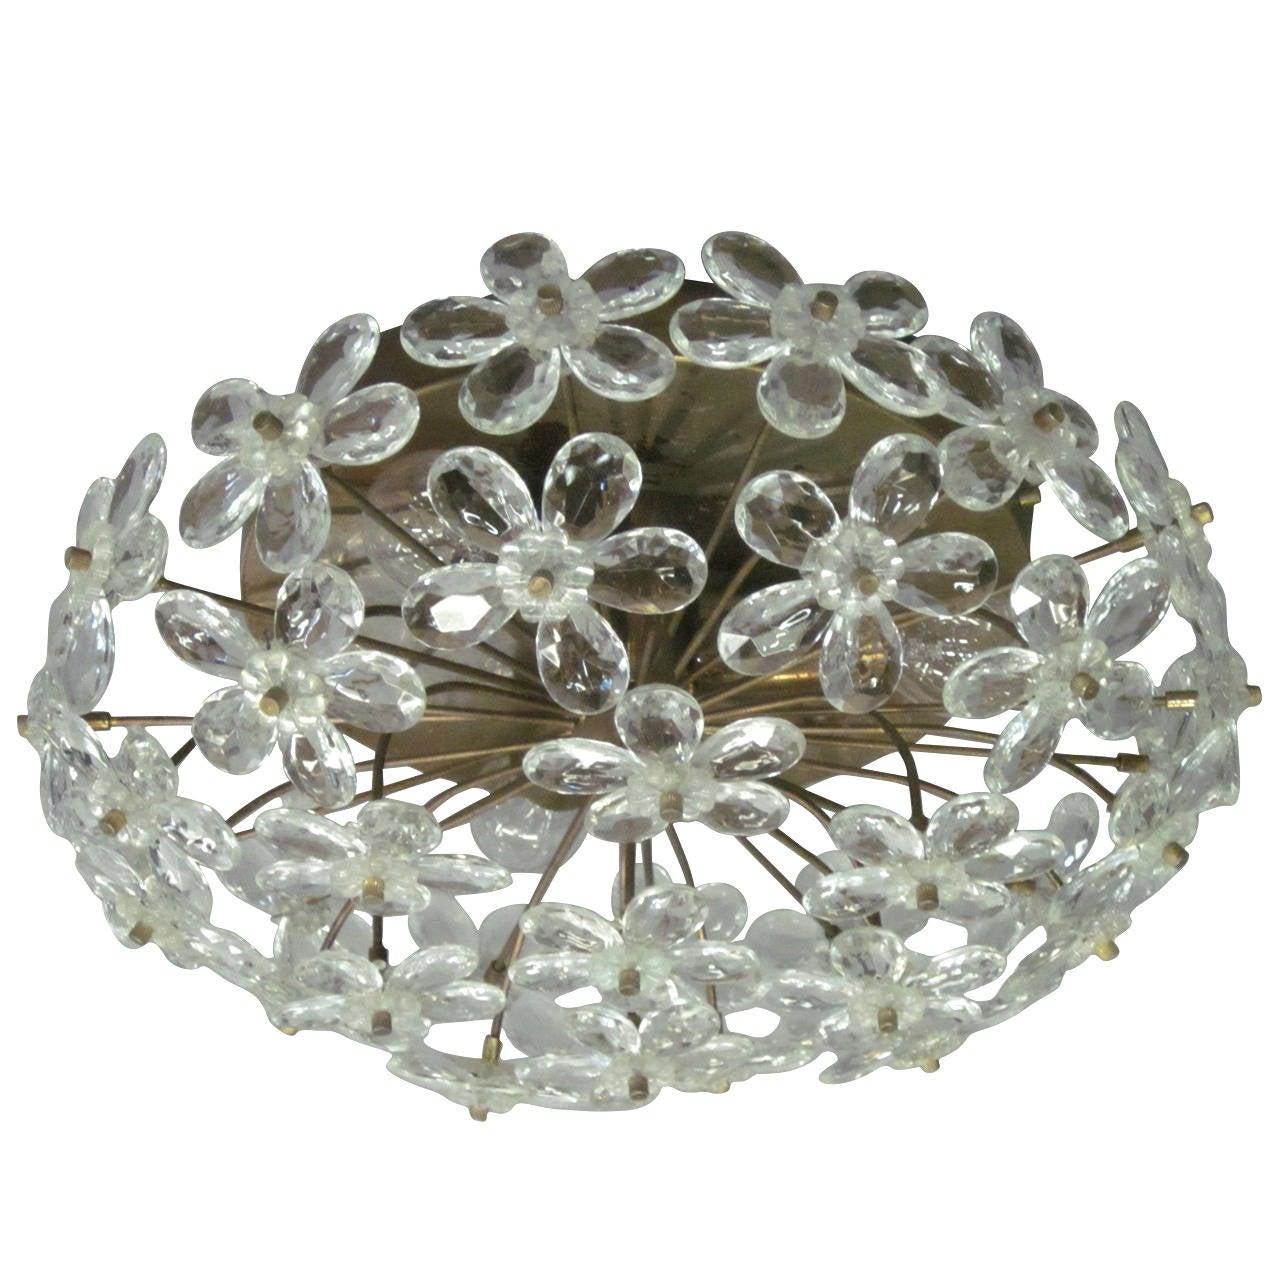 3 Italian Mid-Century Modern Murano Glass / Crystal Floral Flush Mount Fixtures